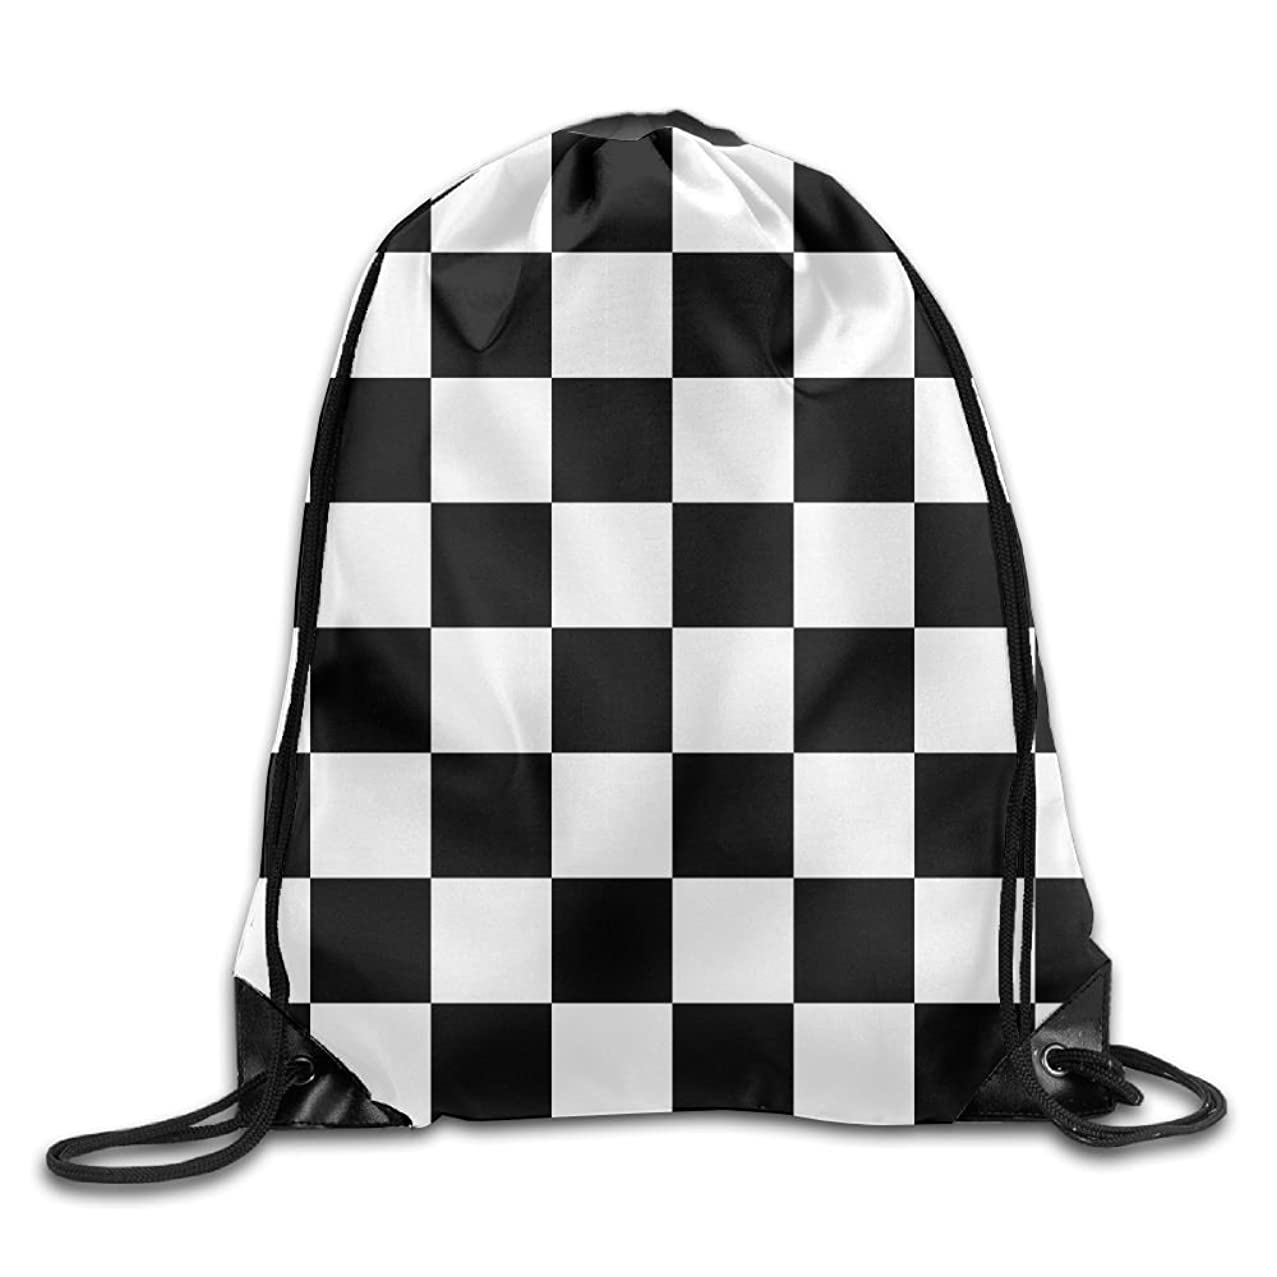 Black White Checkered Pattern3D Print Drawstring Backpack Rucksack Small Shoulder Bags Gym BagPrint Drawstring Backpack